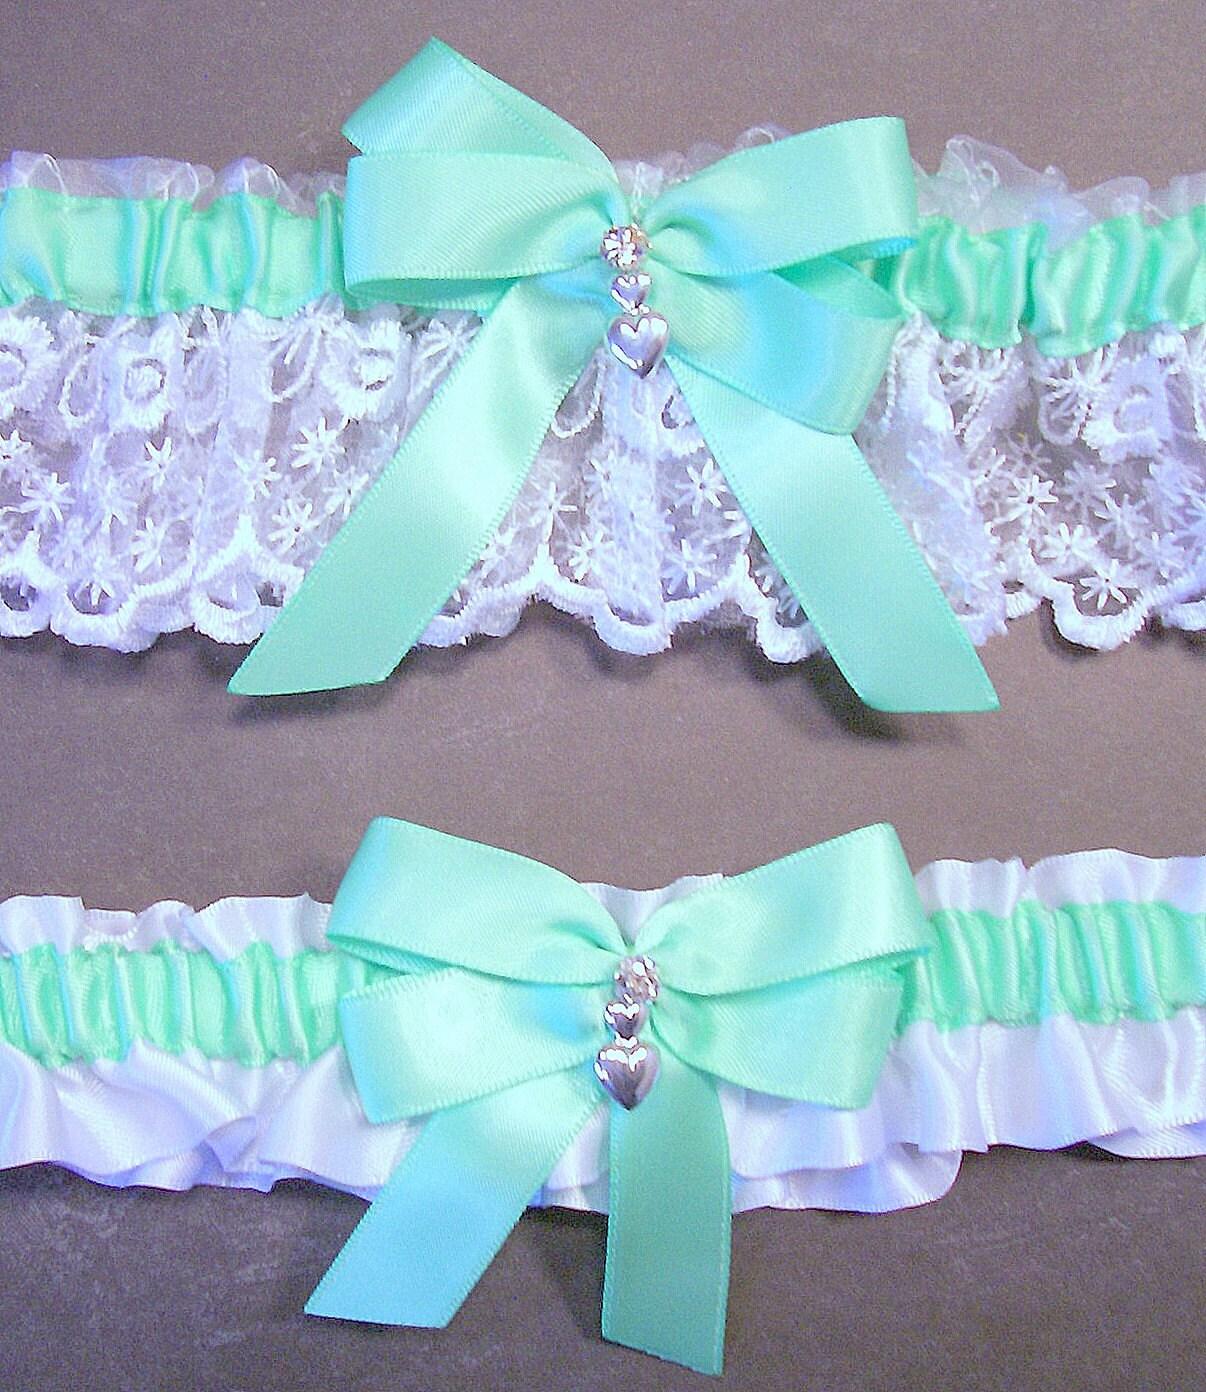 White Wedding Garter: Mint Green On White Wedding Garter Set Bridal By Evertonbridal